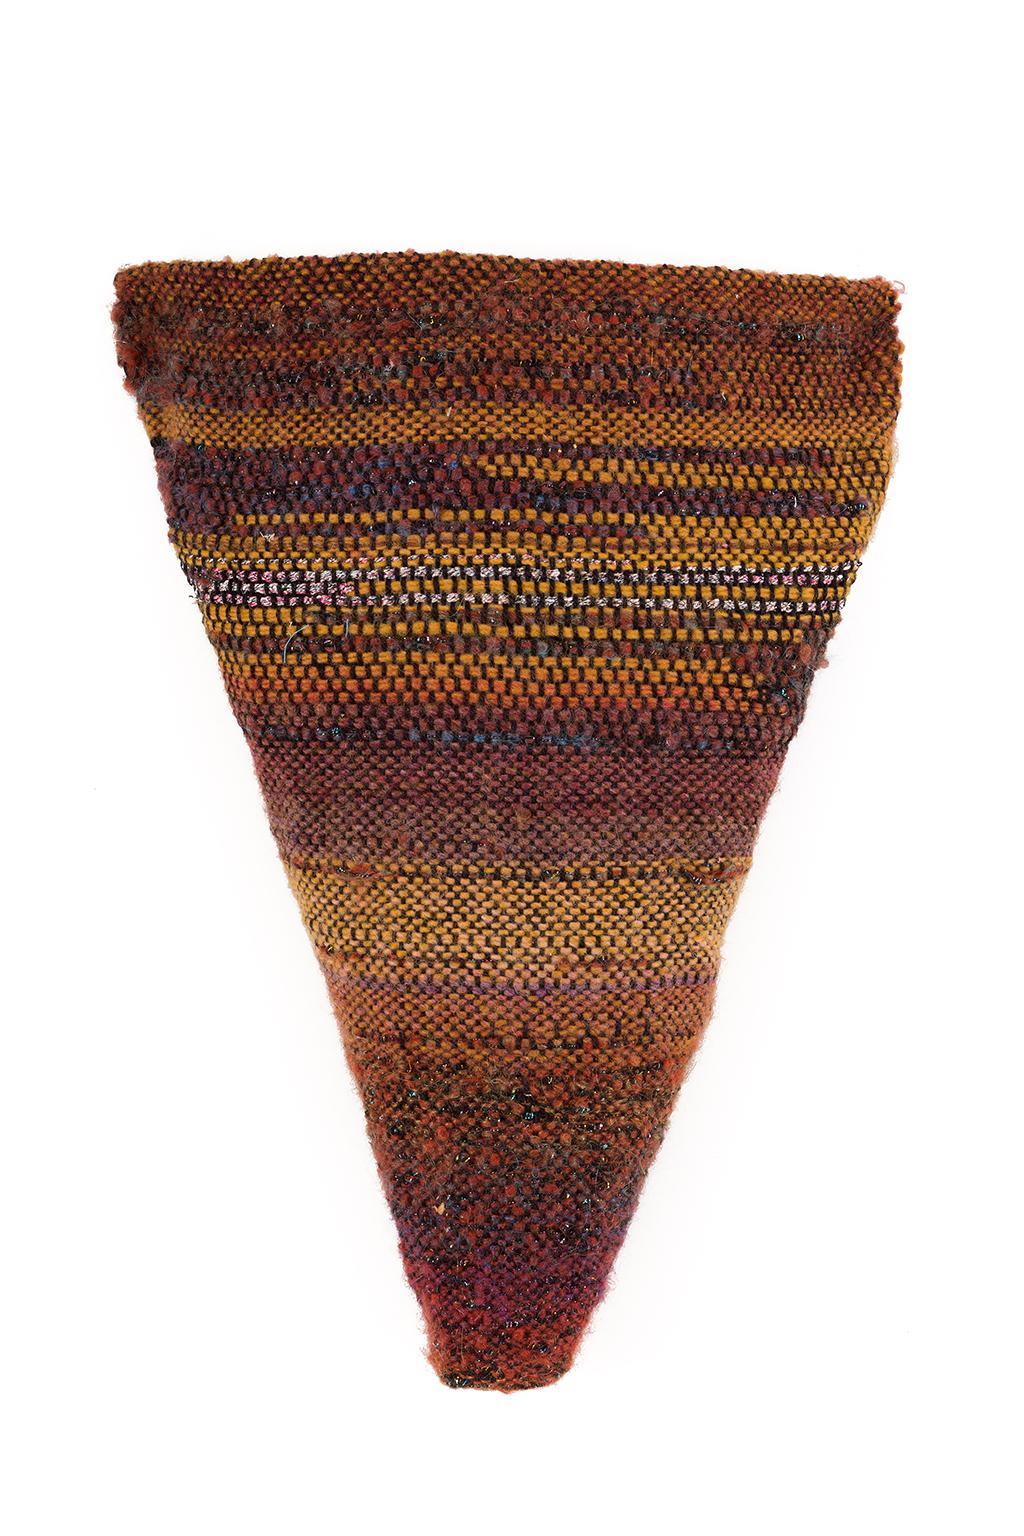 Sylvia Vander Sluis,  Earthy Torso 1,  Handwoven wool, beads, 17x13x3